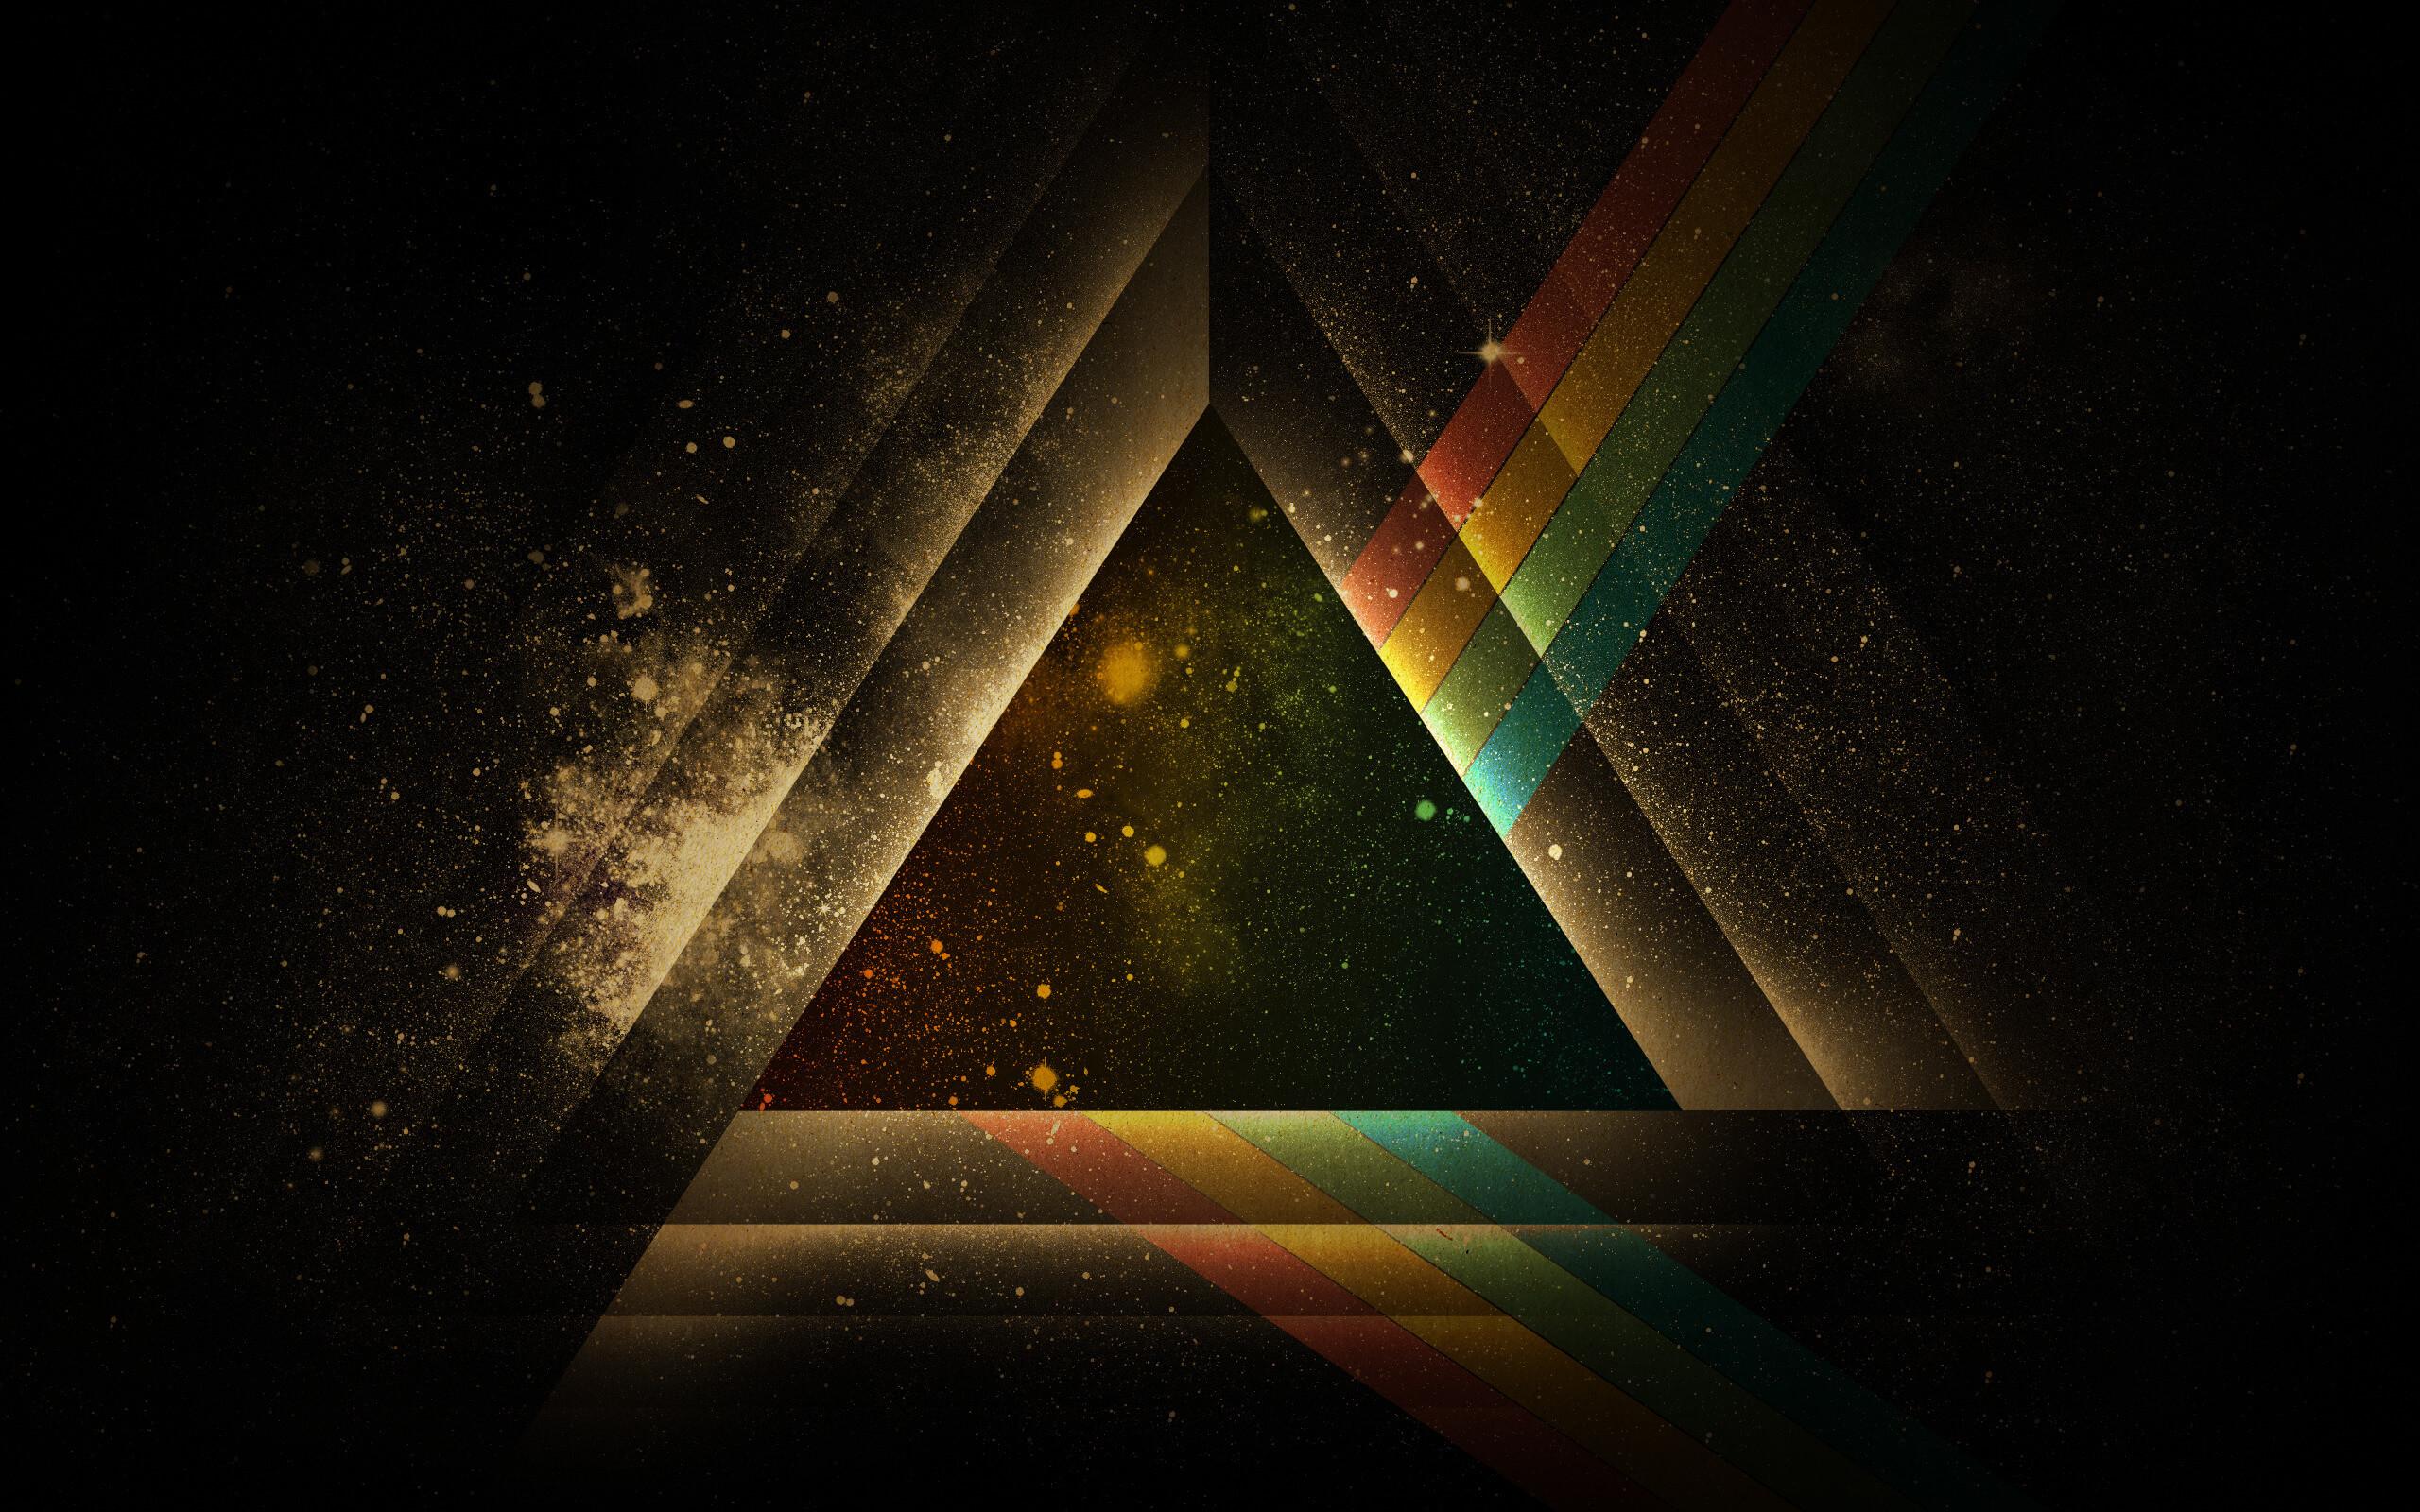 White-Geometric-Triangle-Wallpaper-14